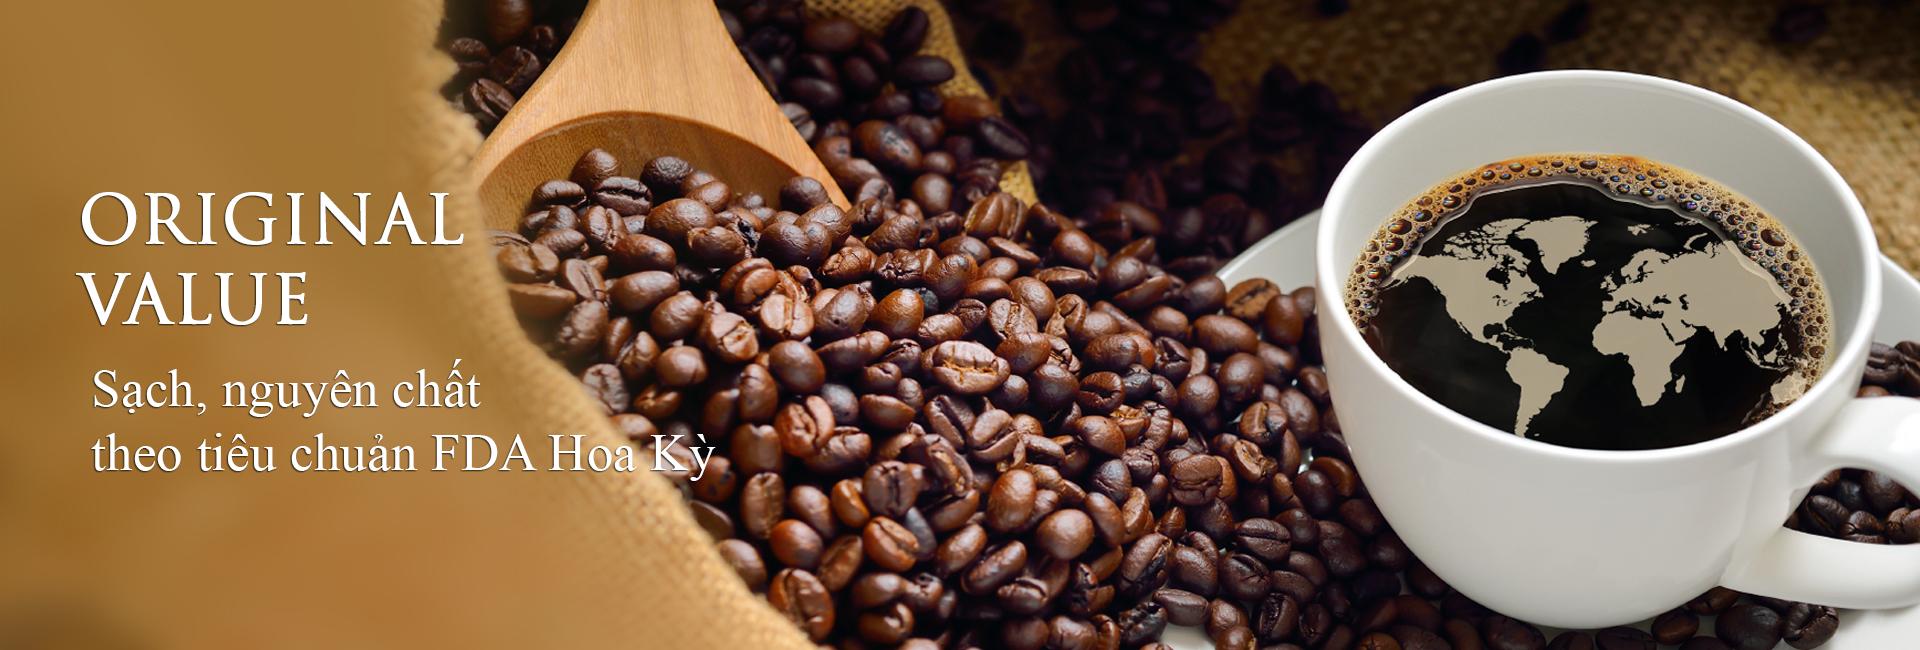 ORIGINAL VALUE COFFEE